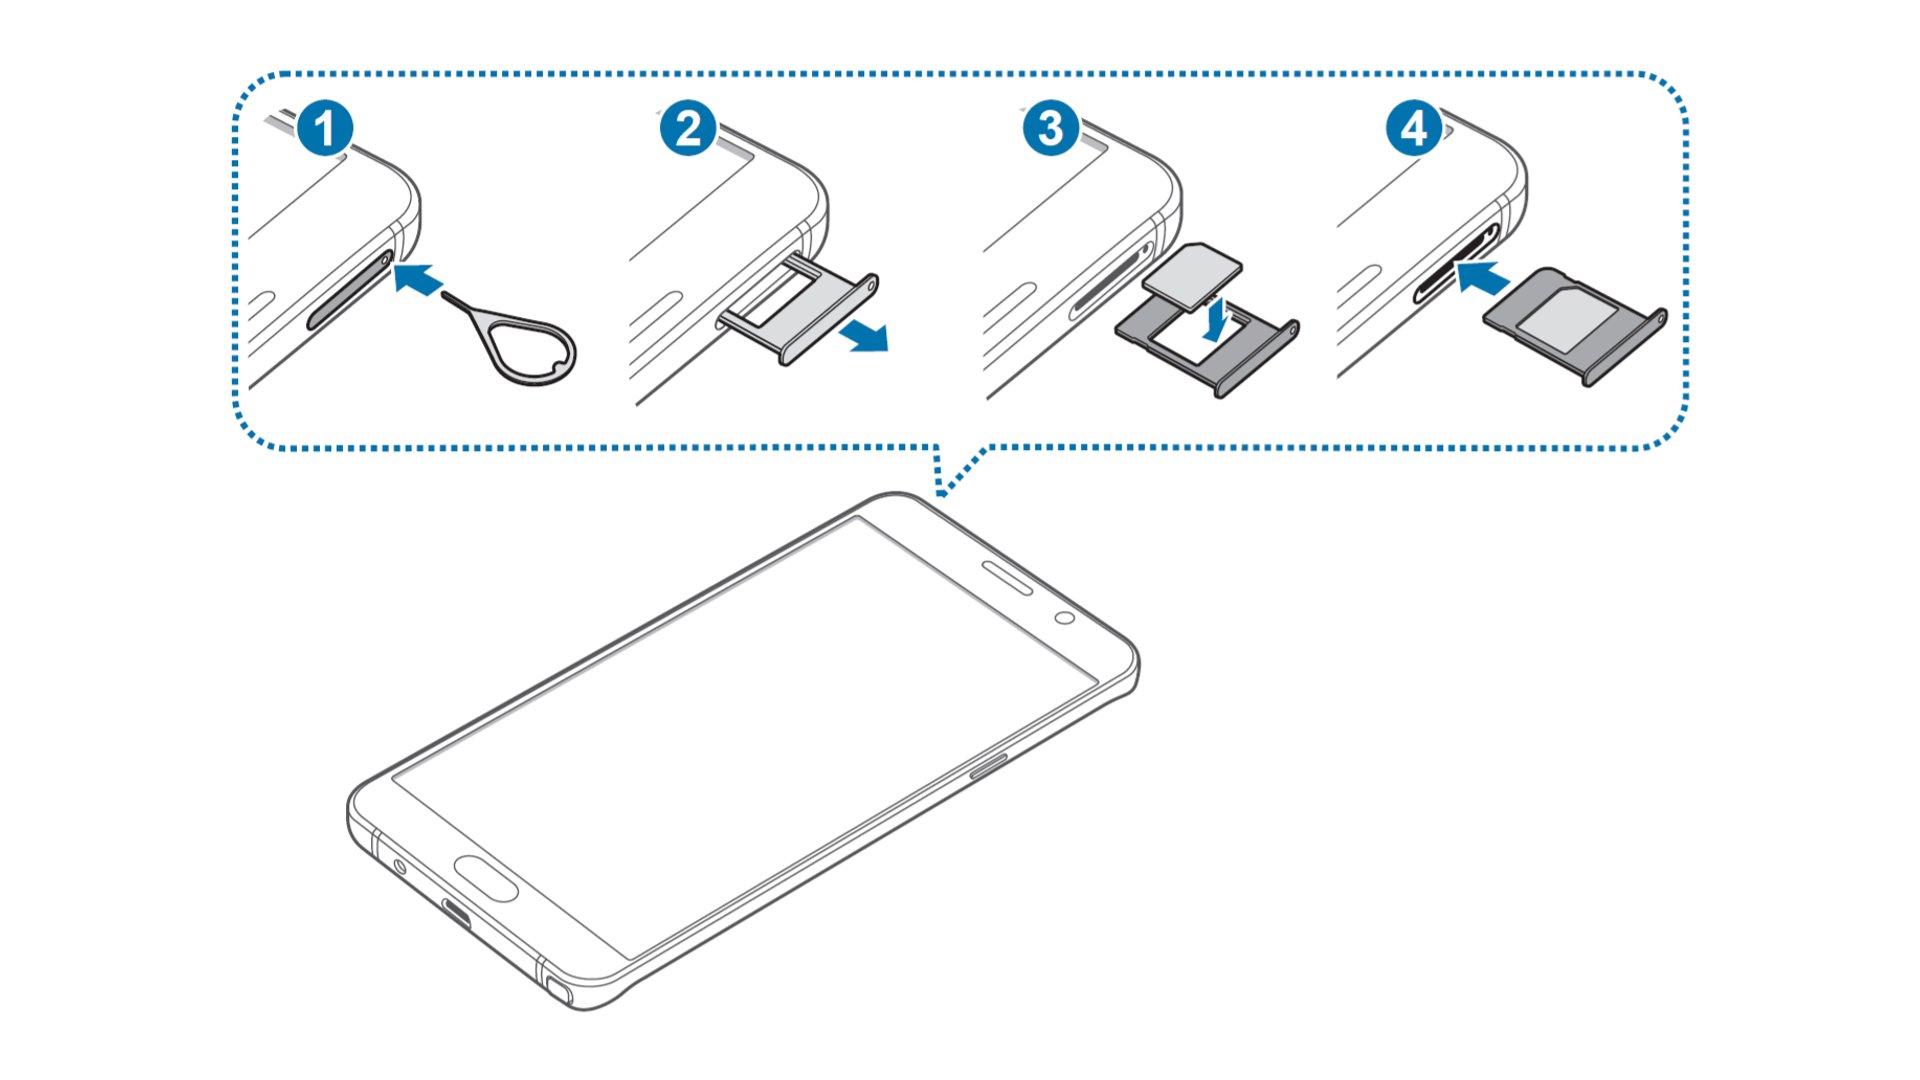 Samsung Galaxy Note 5 Using Sim Usim And Dual Sim